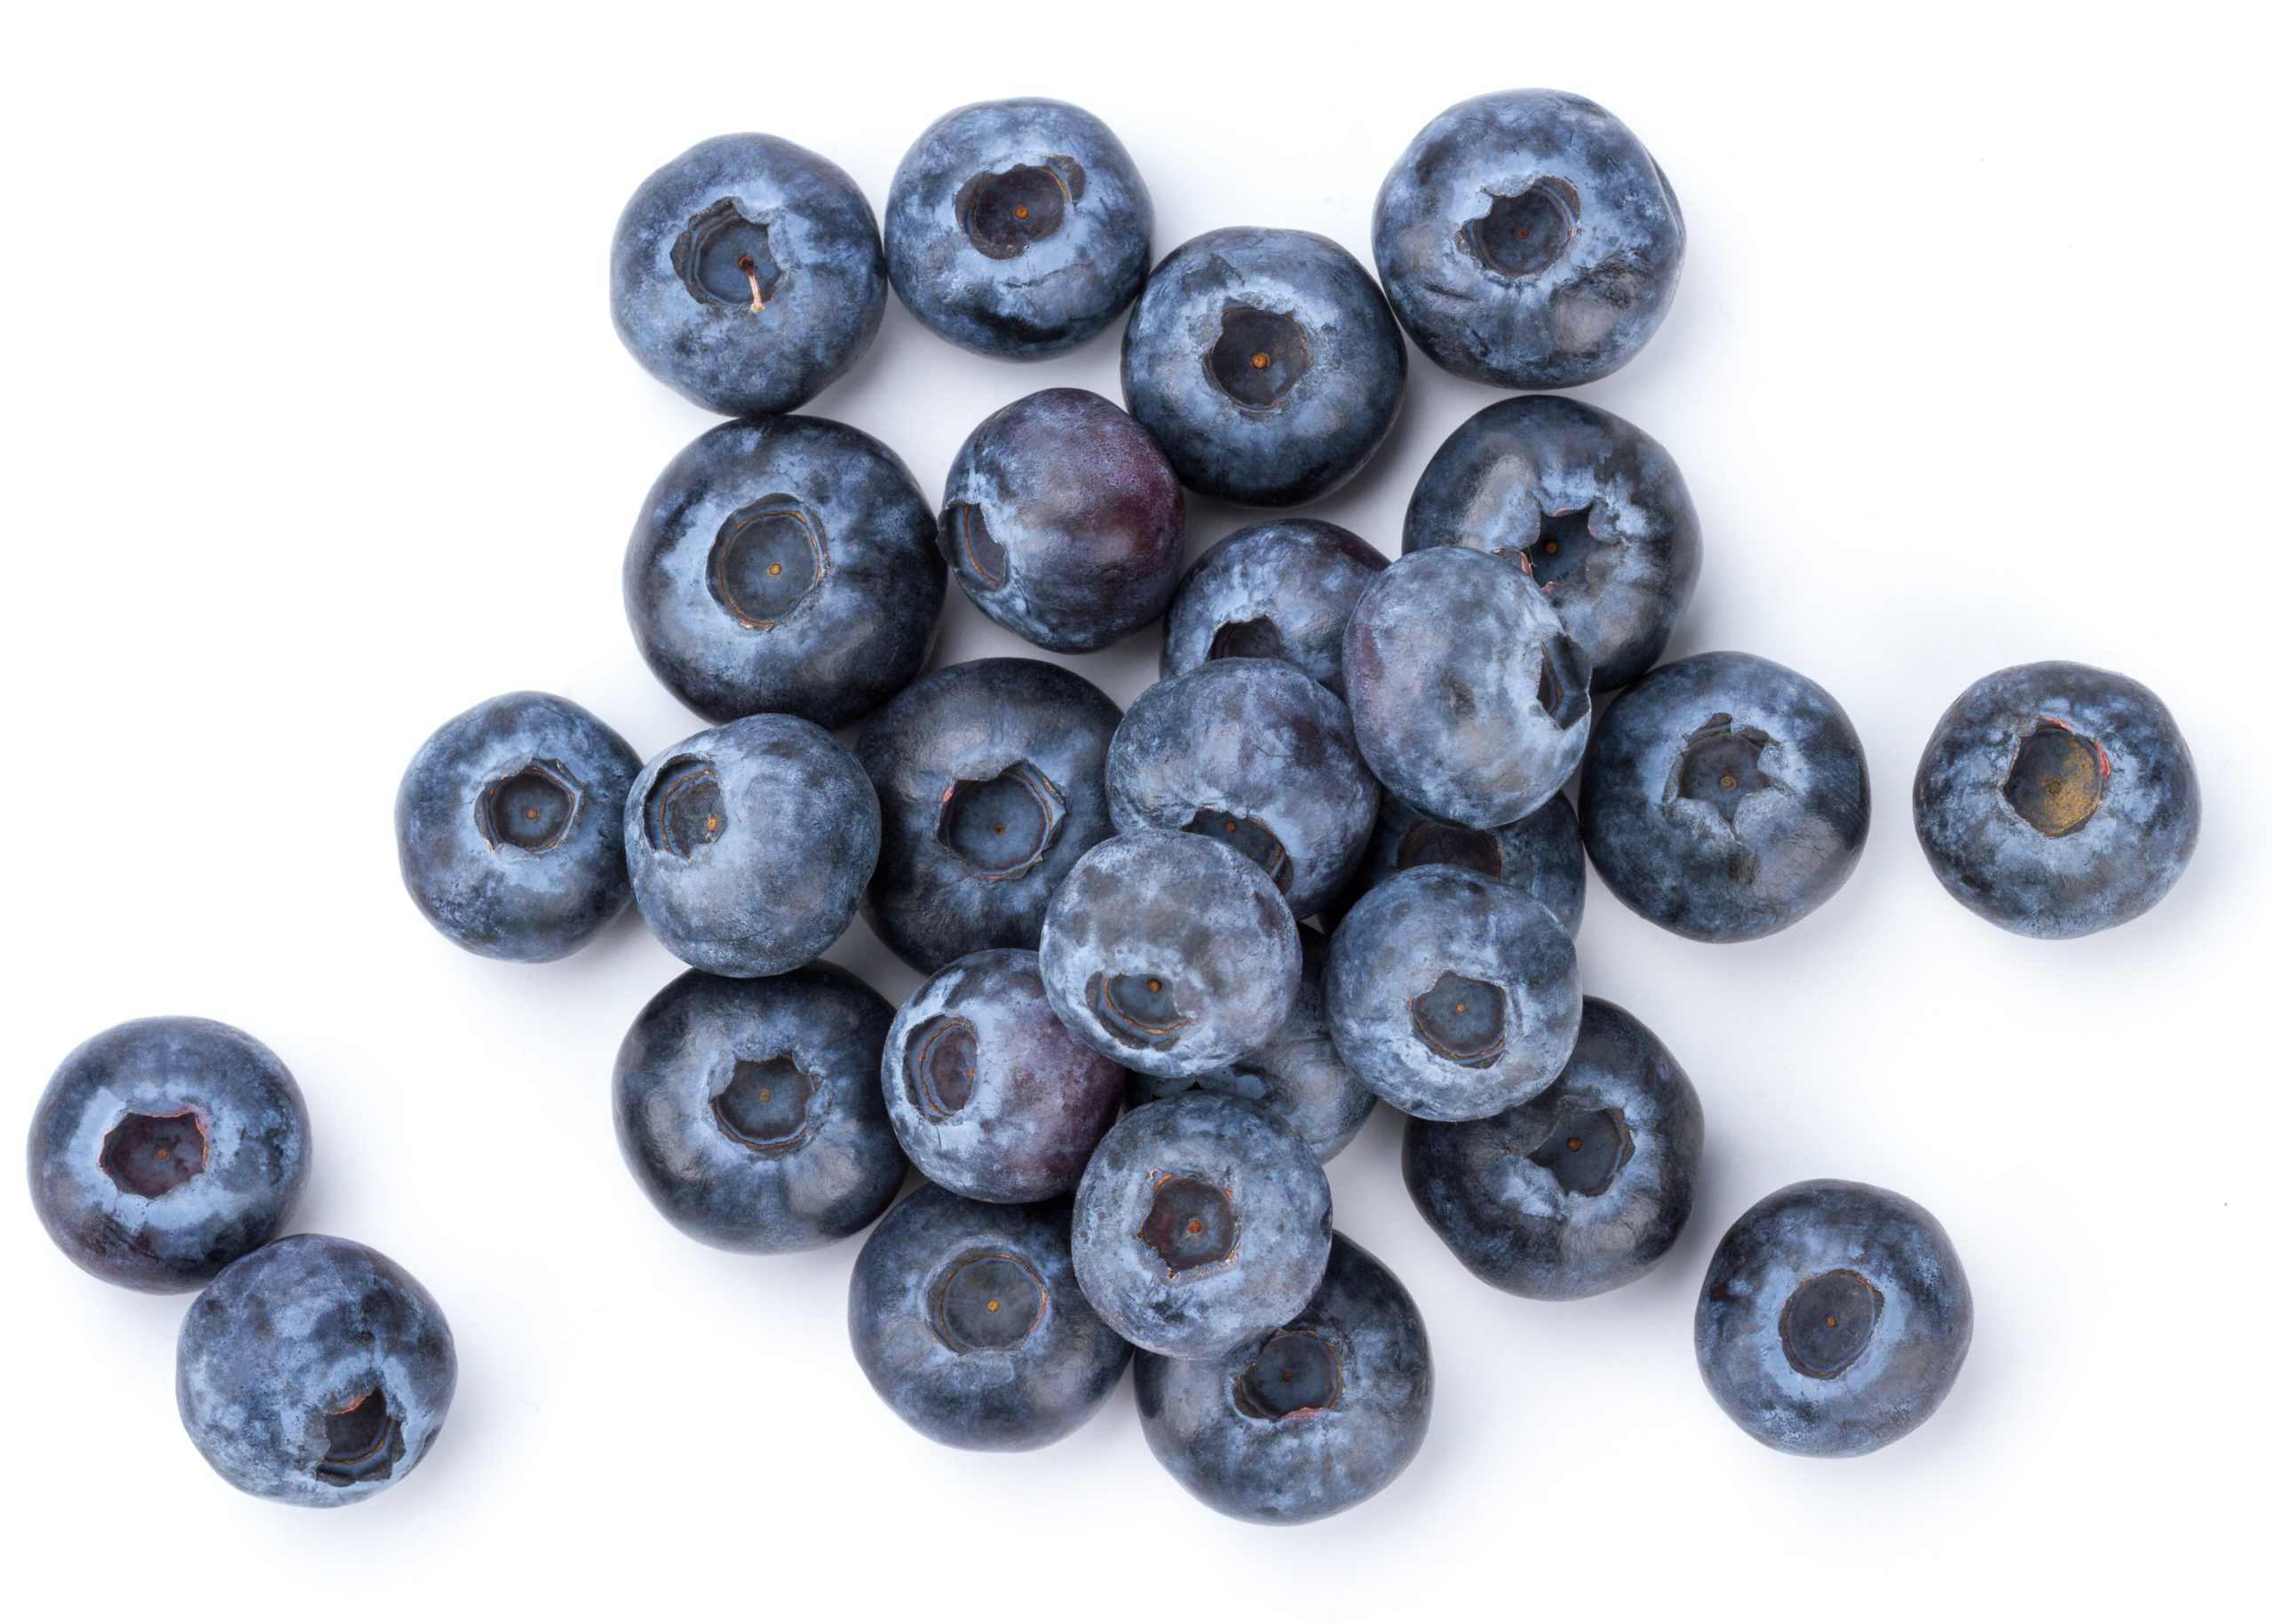 Organic Blueberries - 2/$5